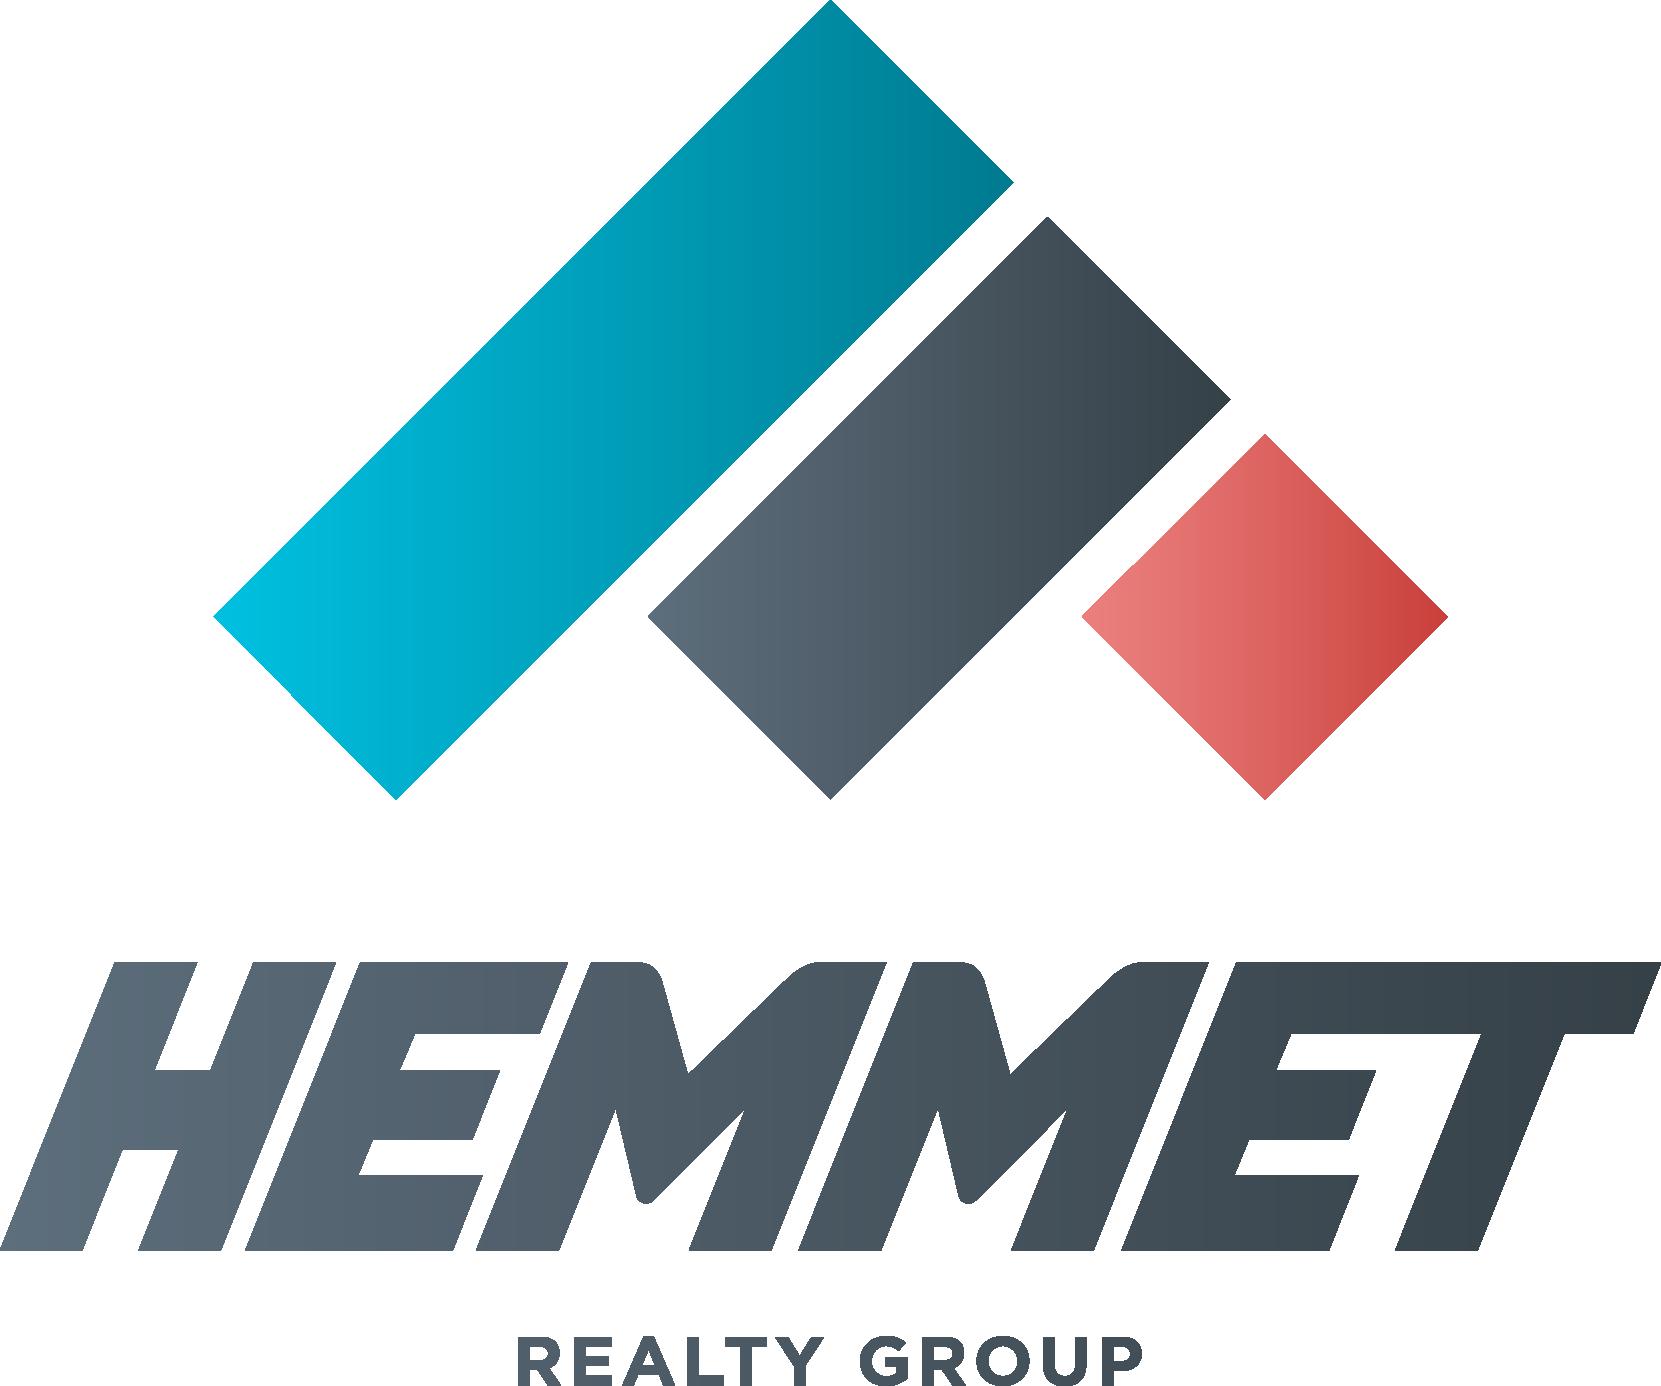 Hemmet_-_Gradient_Logo.png